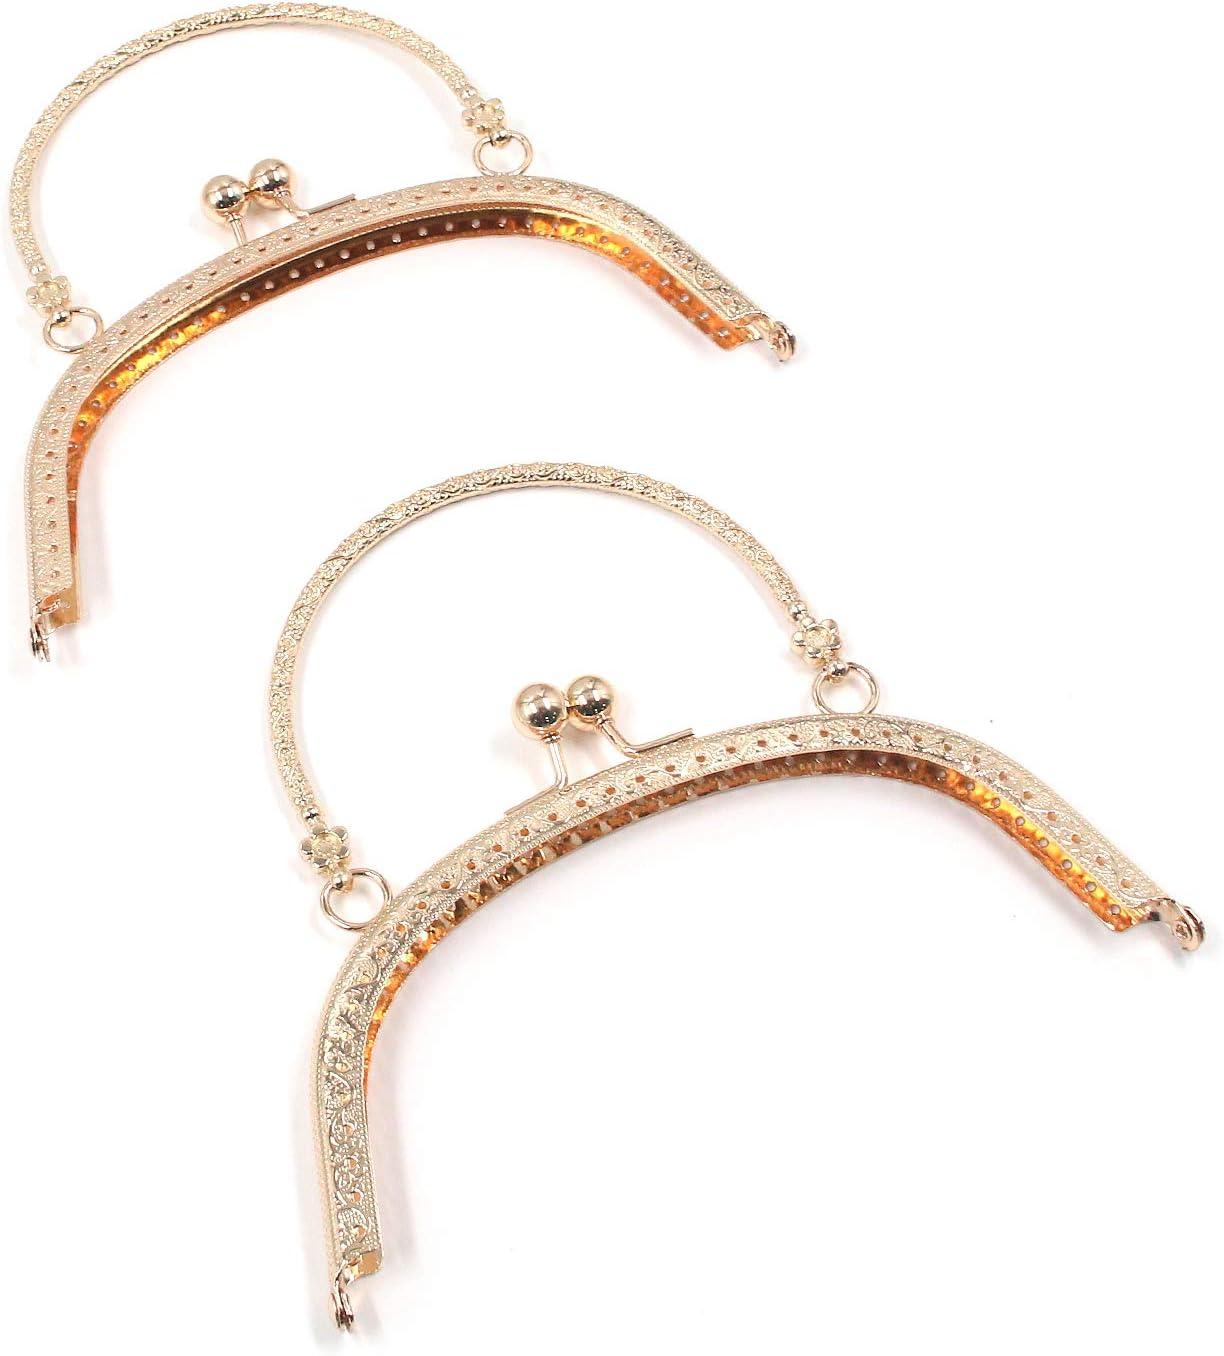 Healifty 6pcs Metal Purse Frames Handbag Coin Purse Kiss Clasp Locks Purse Making Supplies for DIY Craft Bag 85mm